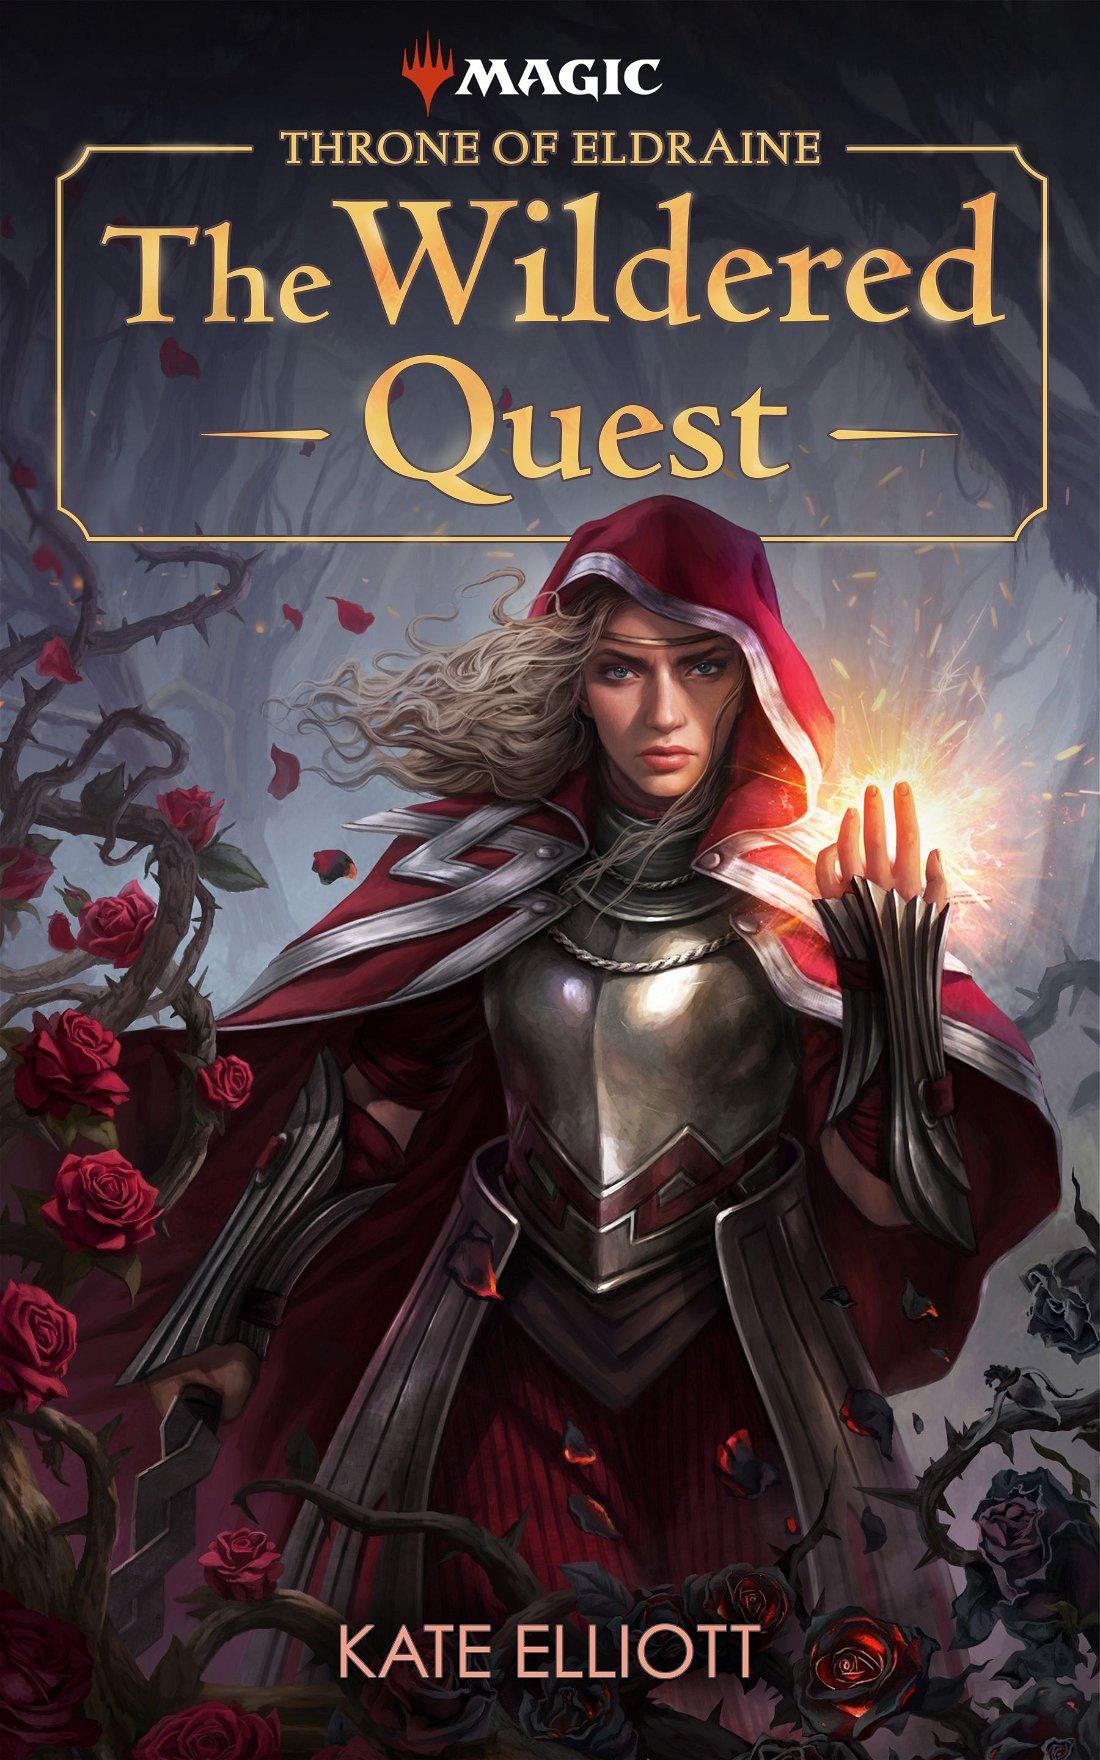 Livro Throne of Eldraine: The Wildered Quest anunciado